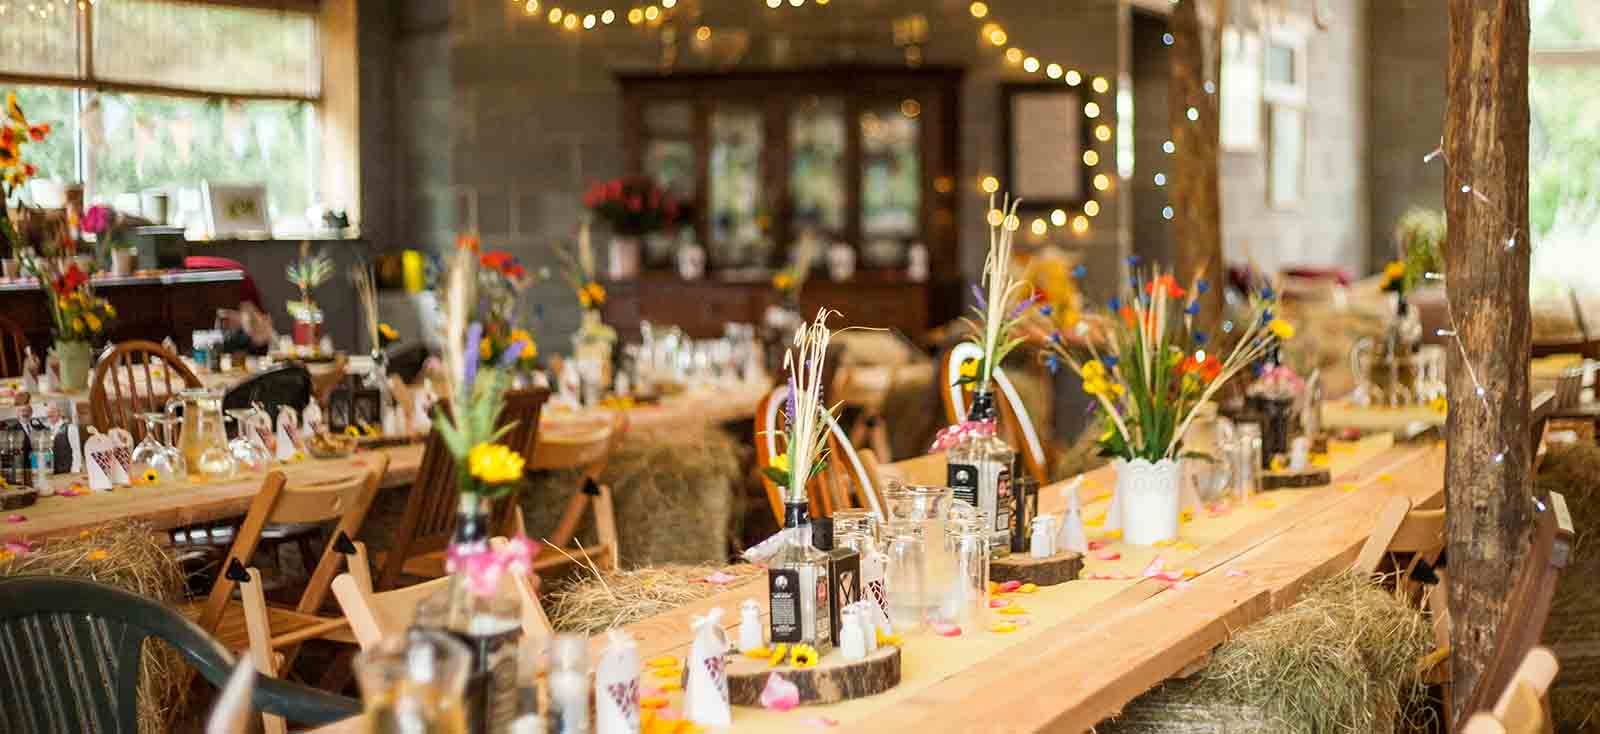 table prepared for wedding breakfast